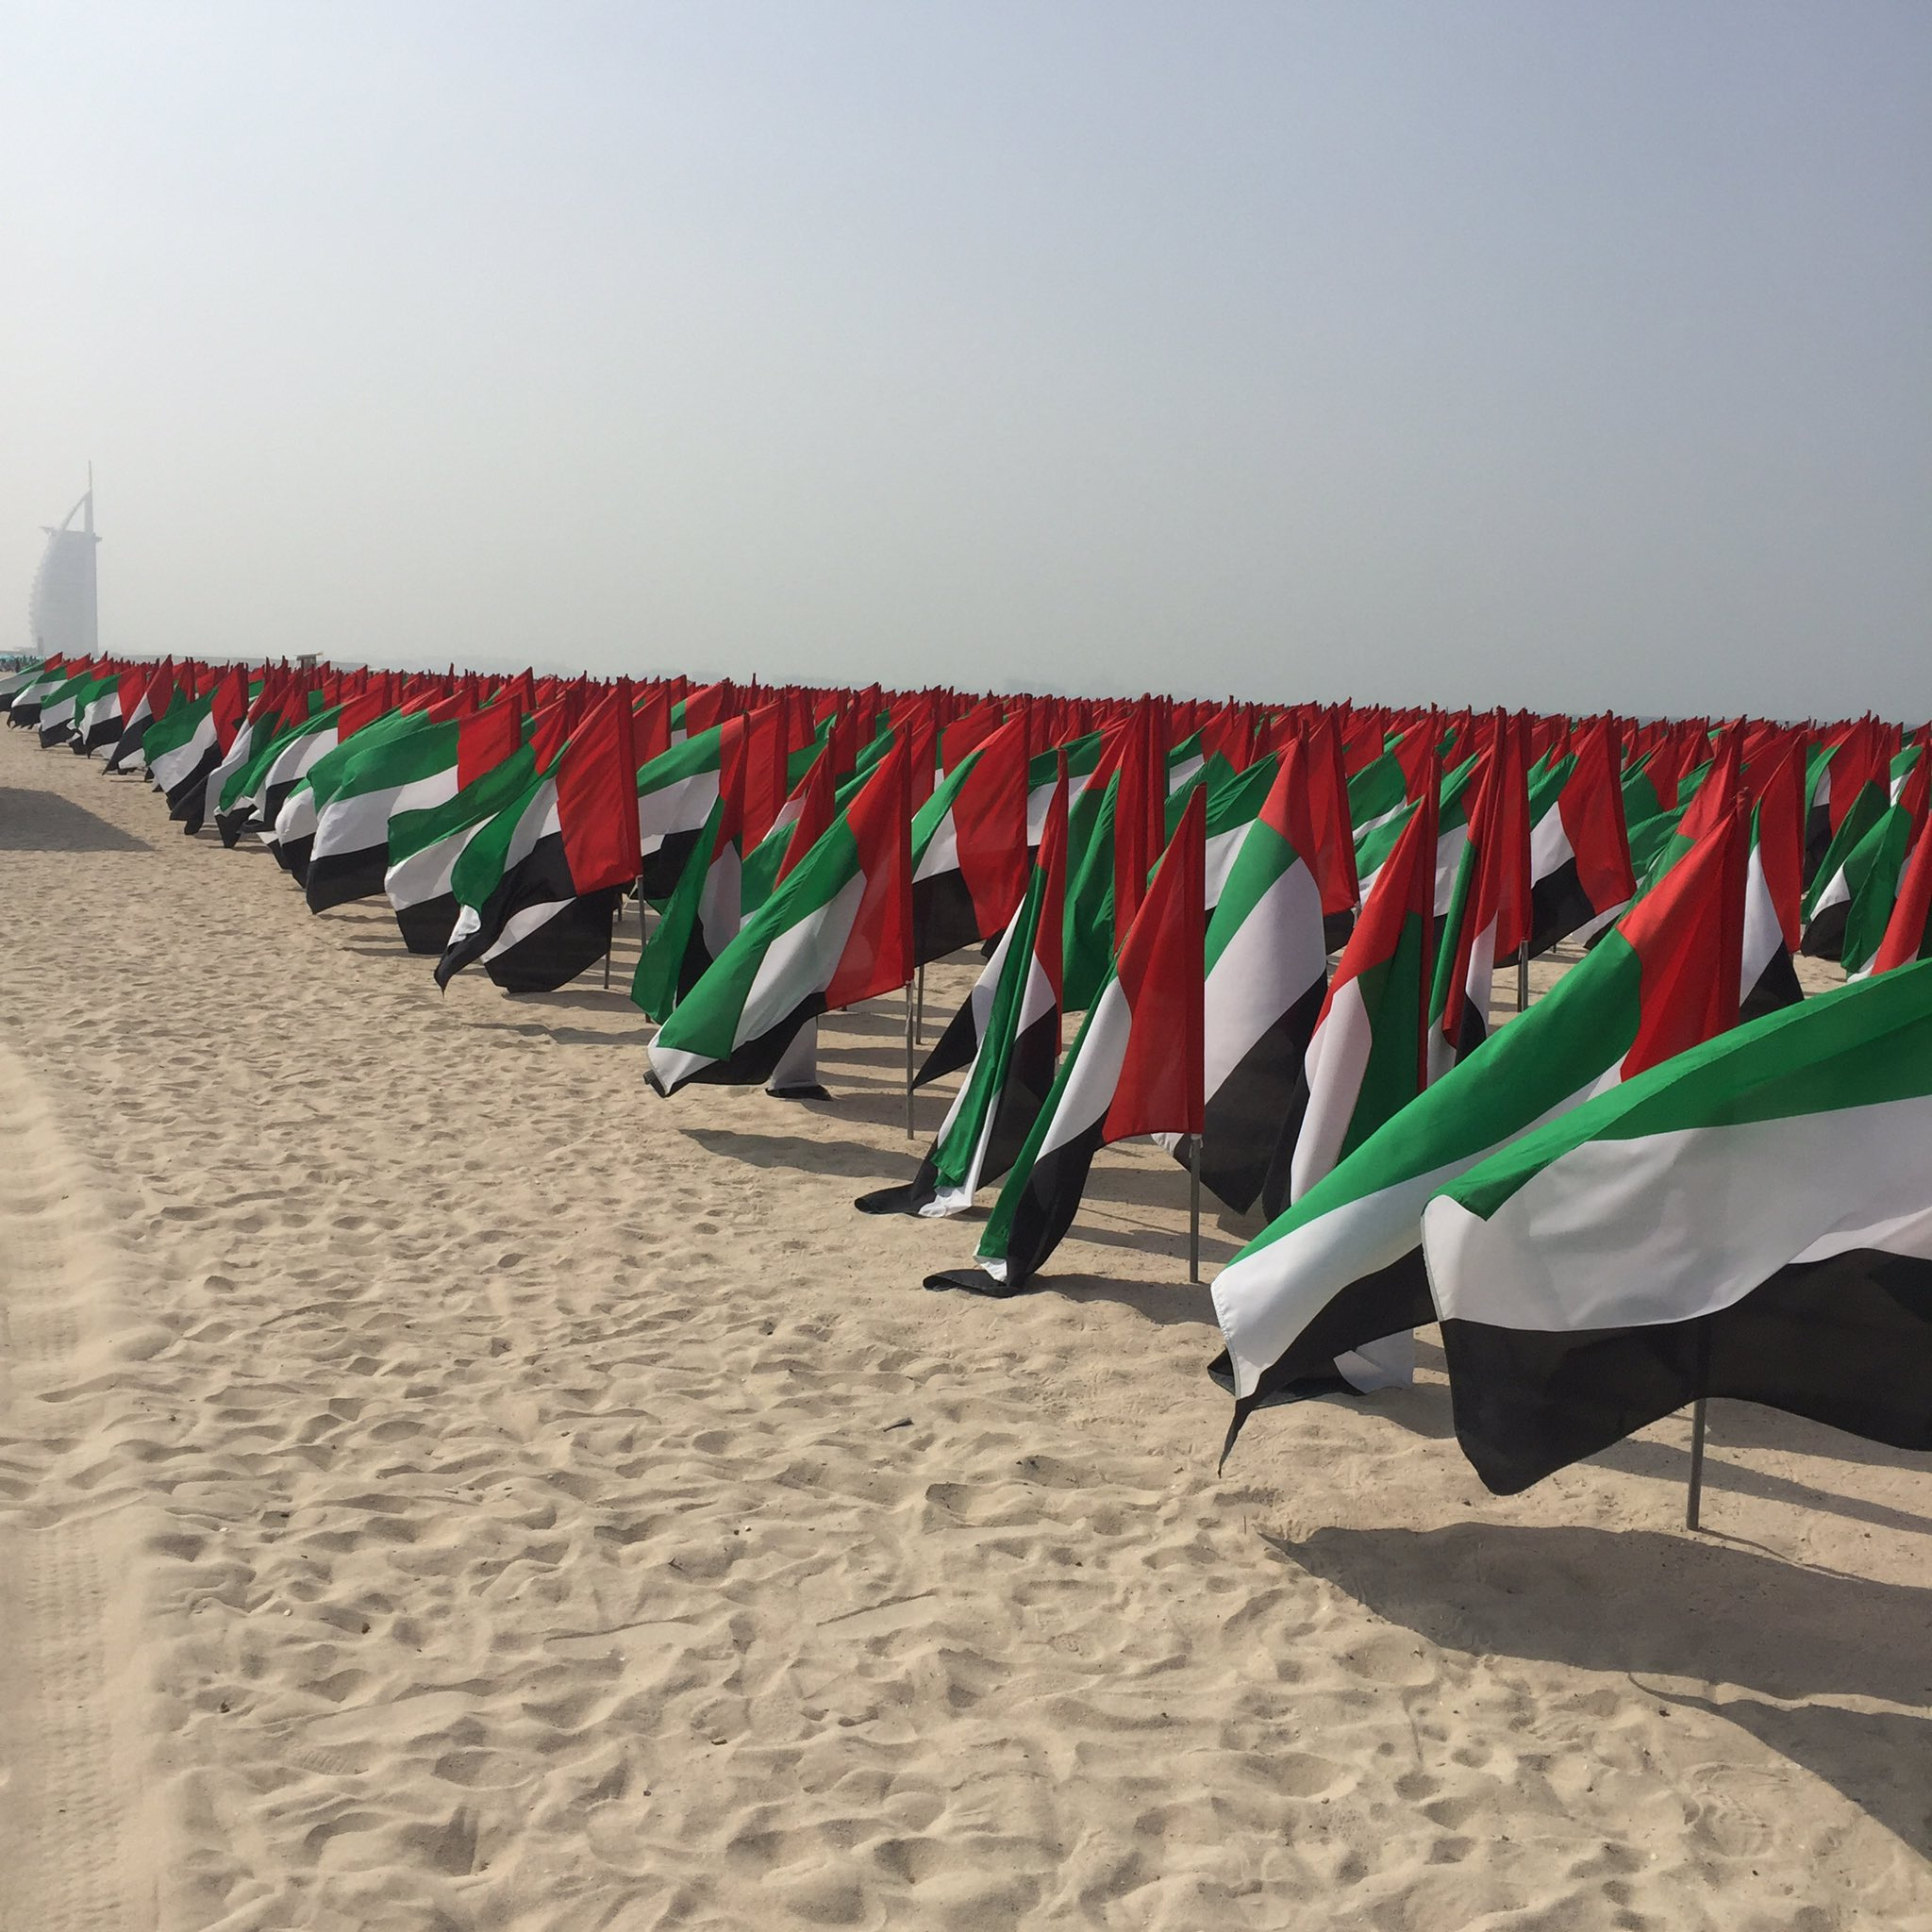 Beach mozhan marnò Blacklist: Why